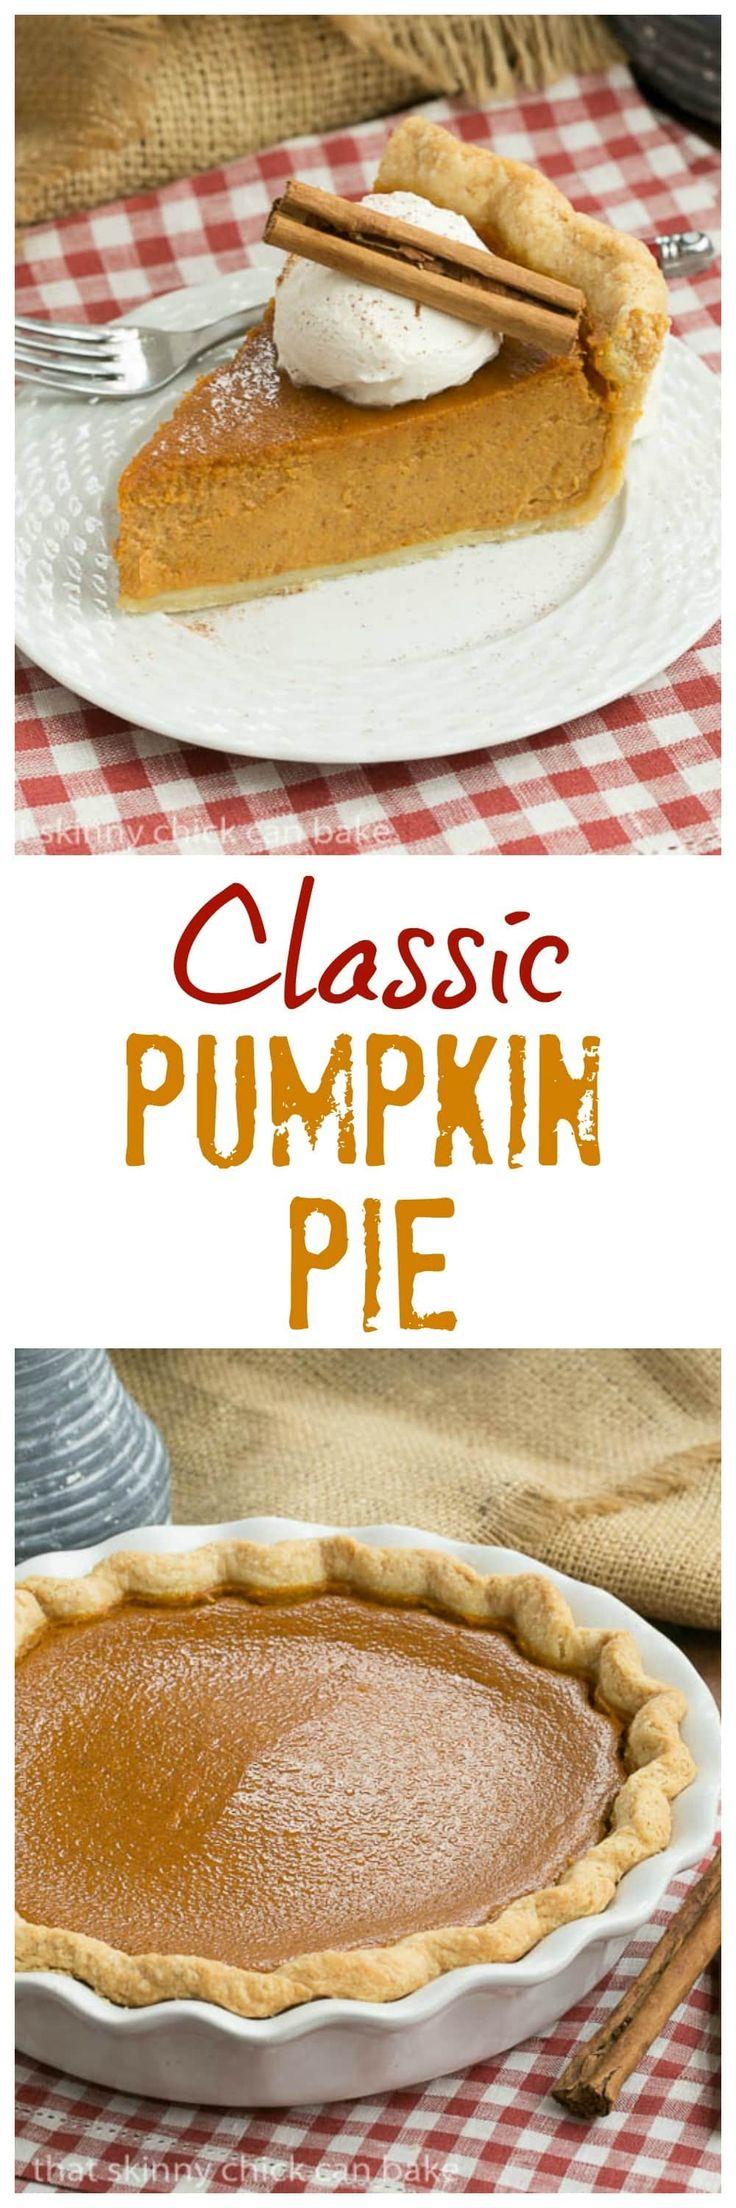 Classic Pumpkin PIe | Libby's recipe on steroids! 3 simple tweaks for the best #thanksgiving pie! #pumpkinpie #desserts